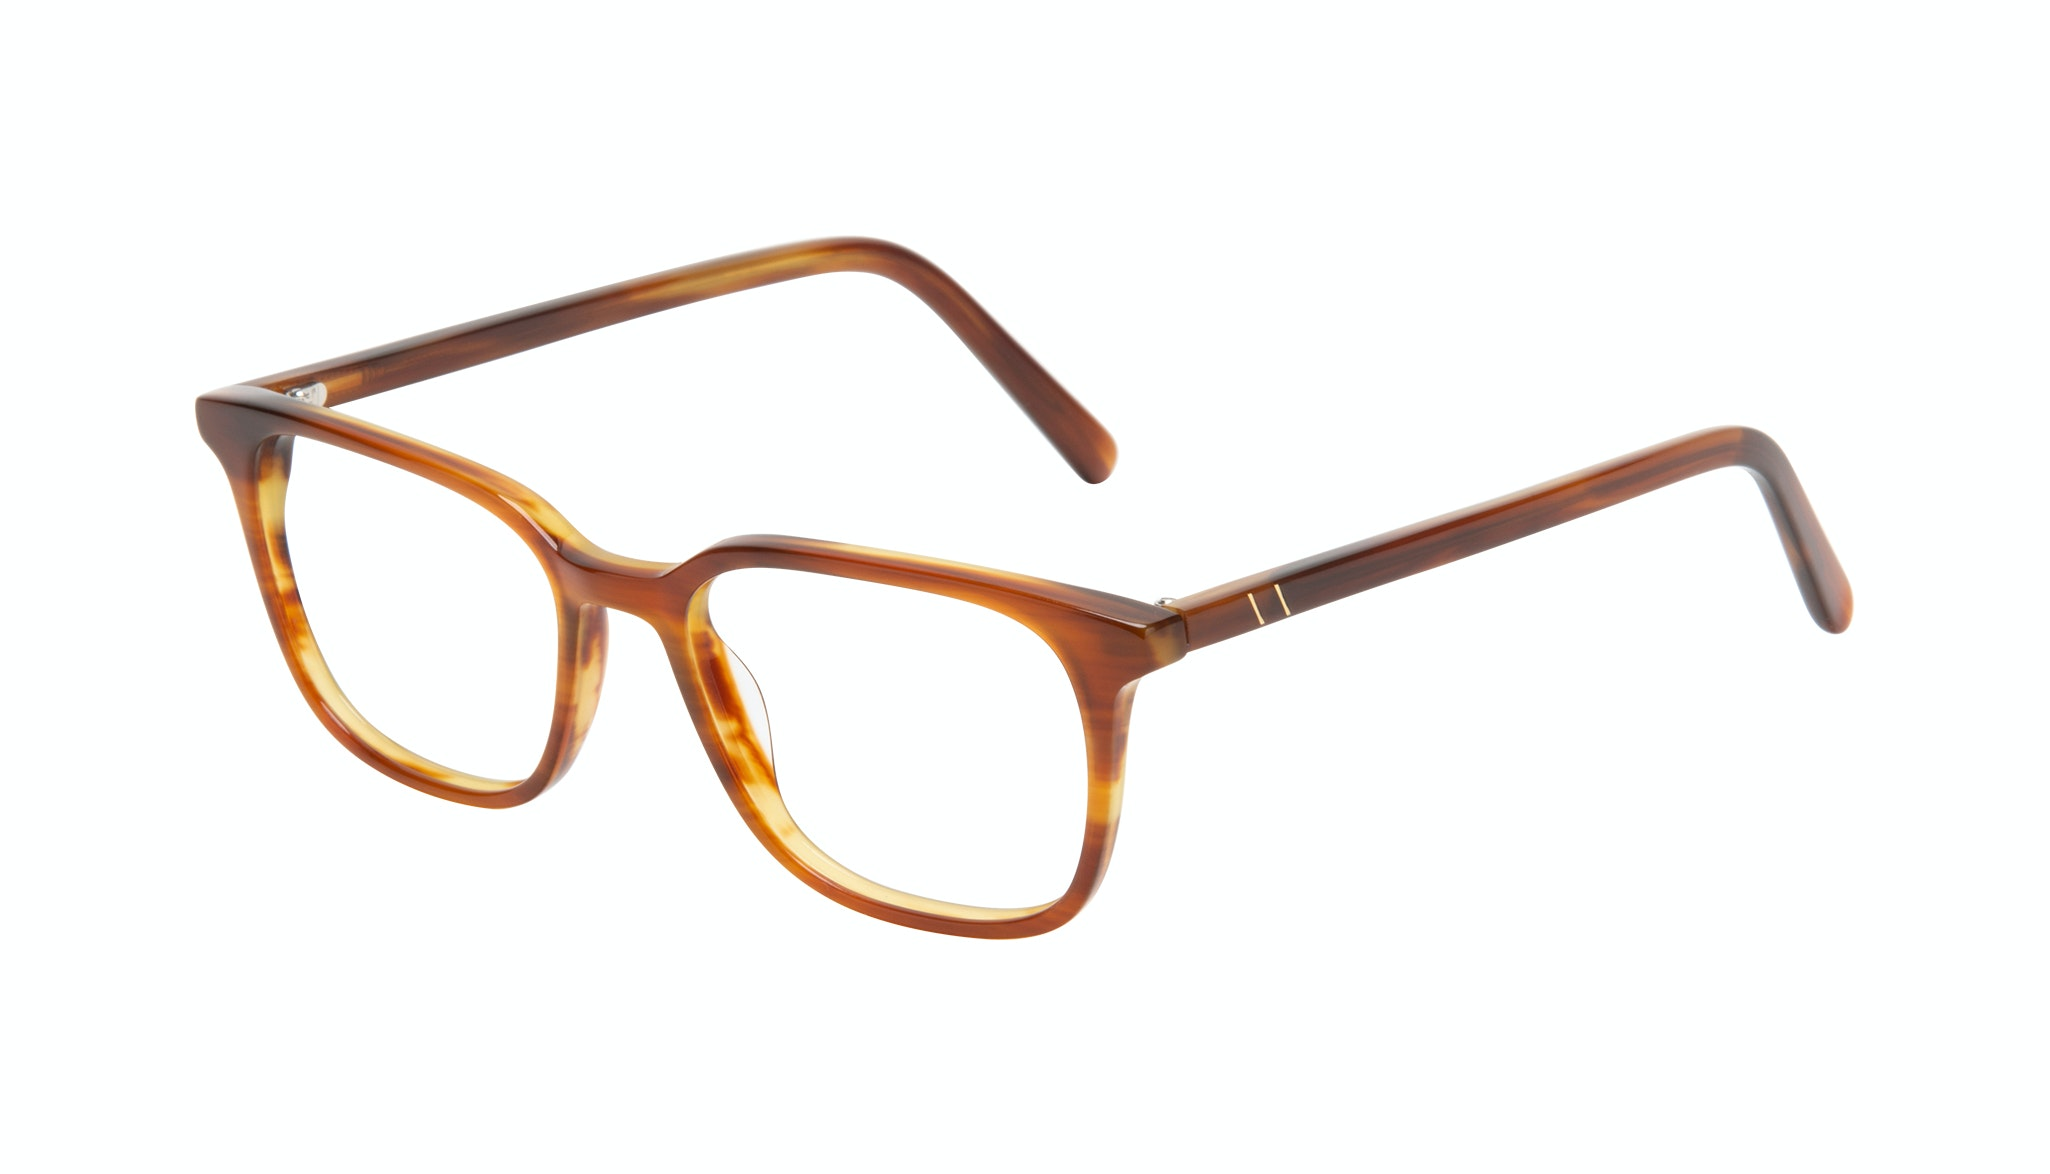 Affordable Fashion Glasses Square Eyeglasses Men Choice Havana Tilt